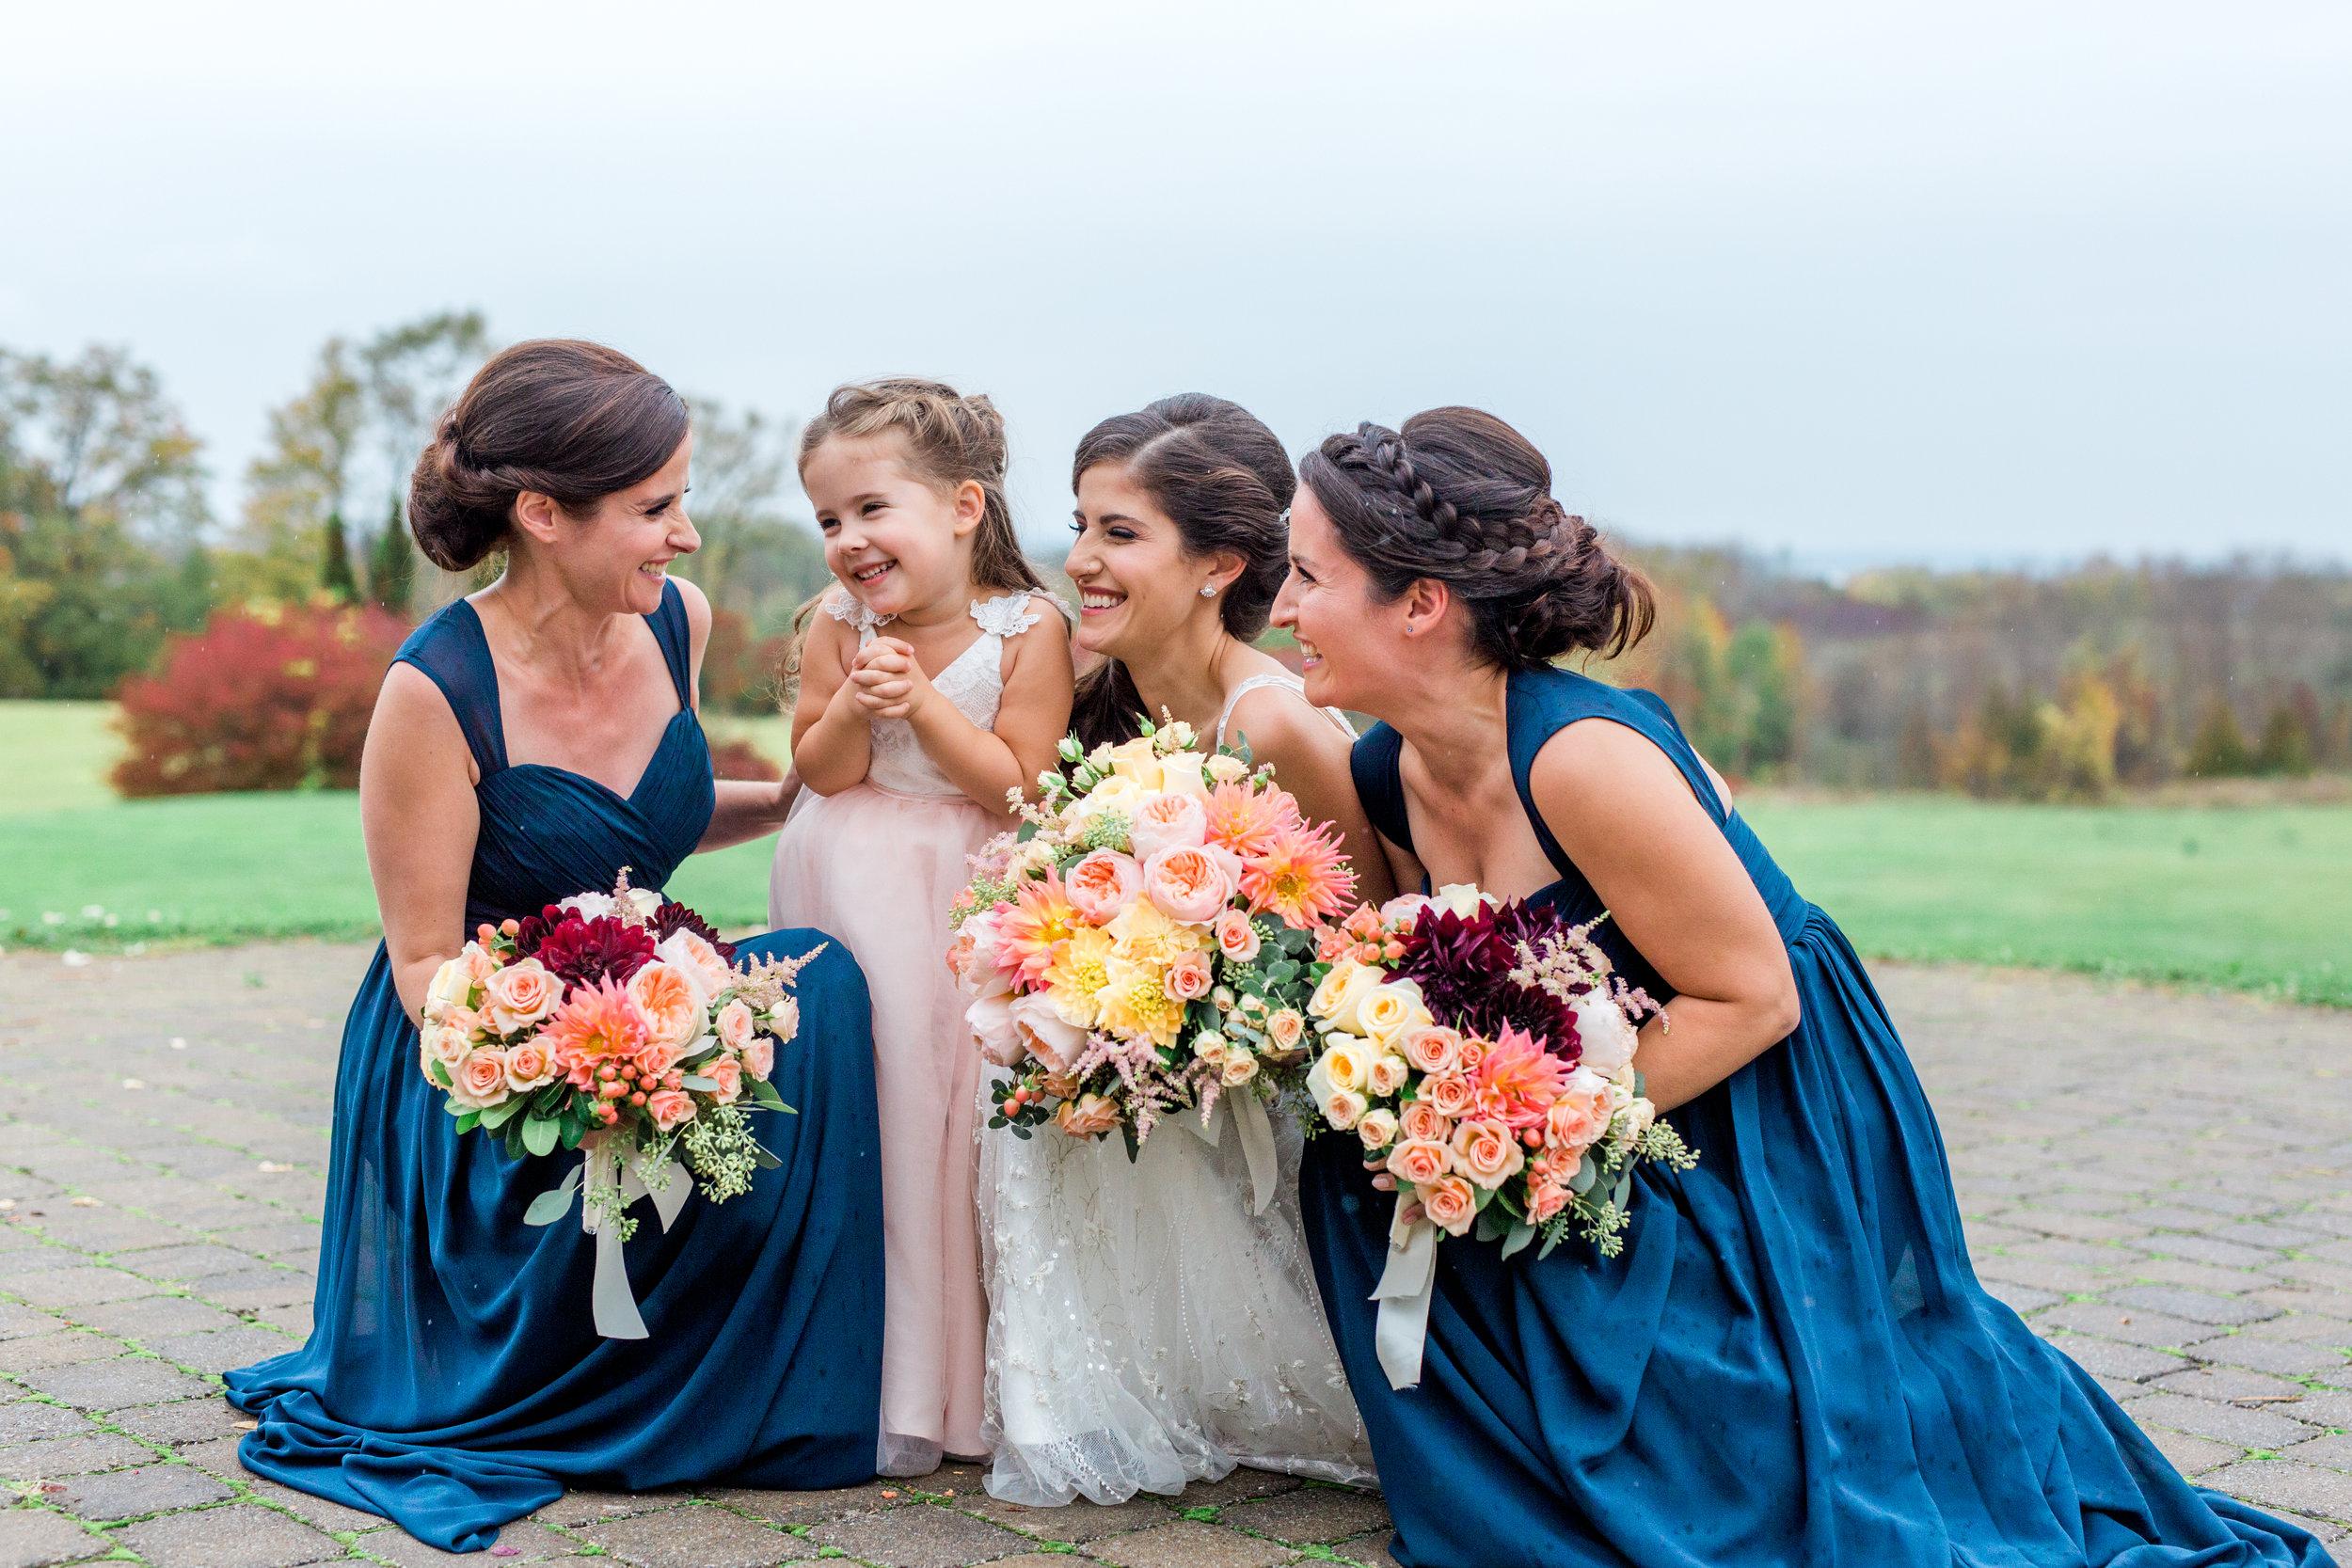 Amir-Golbazi-Danielle-Giroux-Photography_Toronto-Wedding_Cedarwood_Rachel-Paul_438.jpg